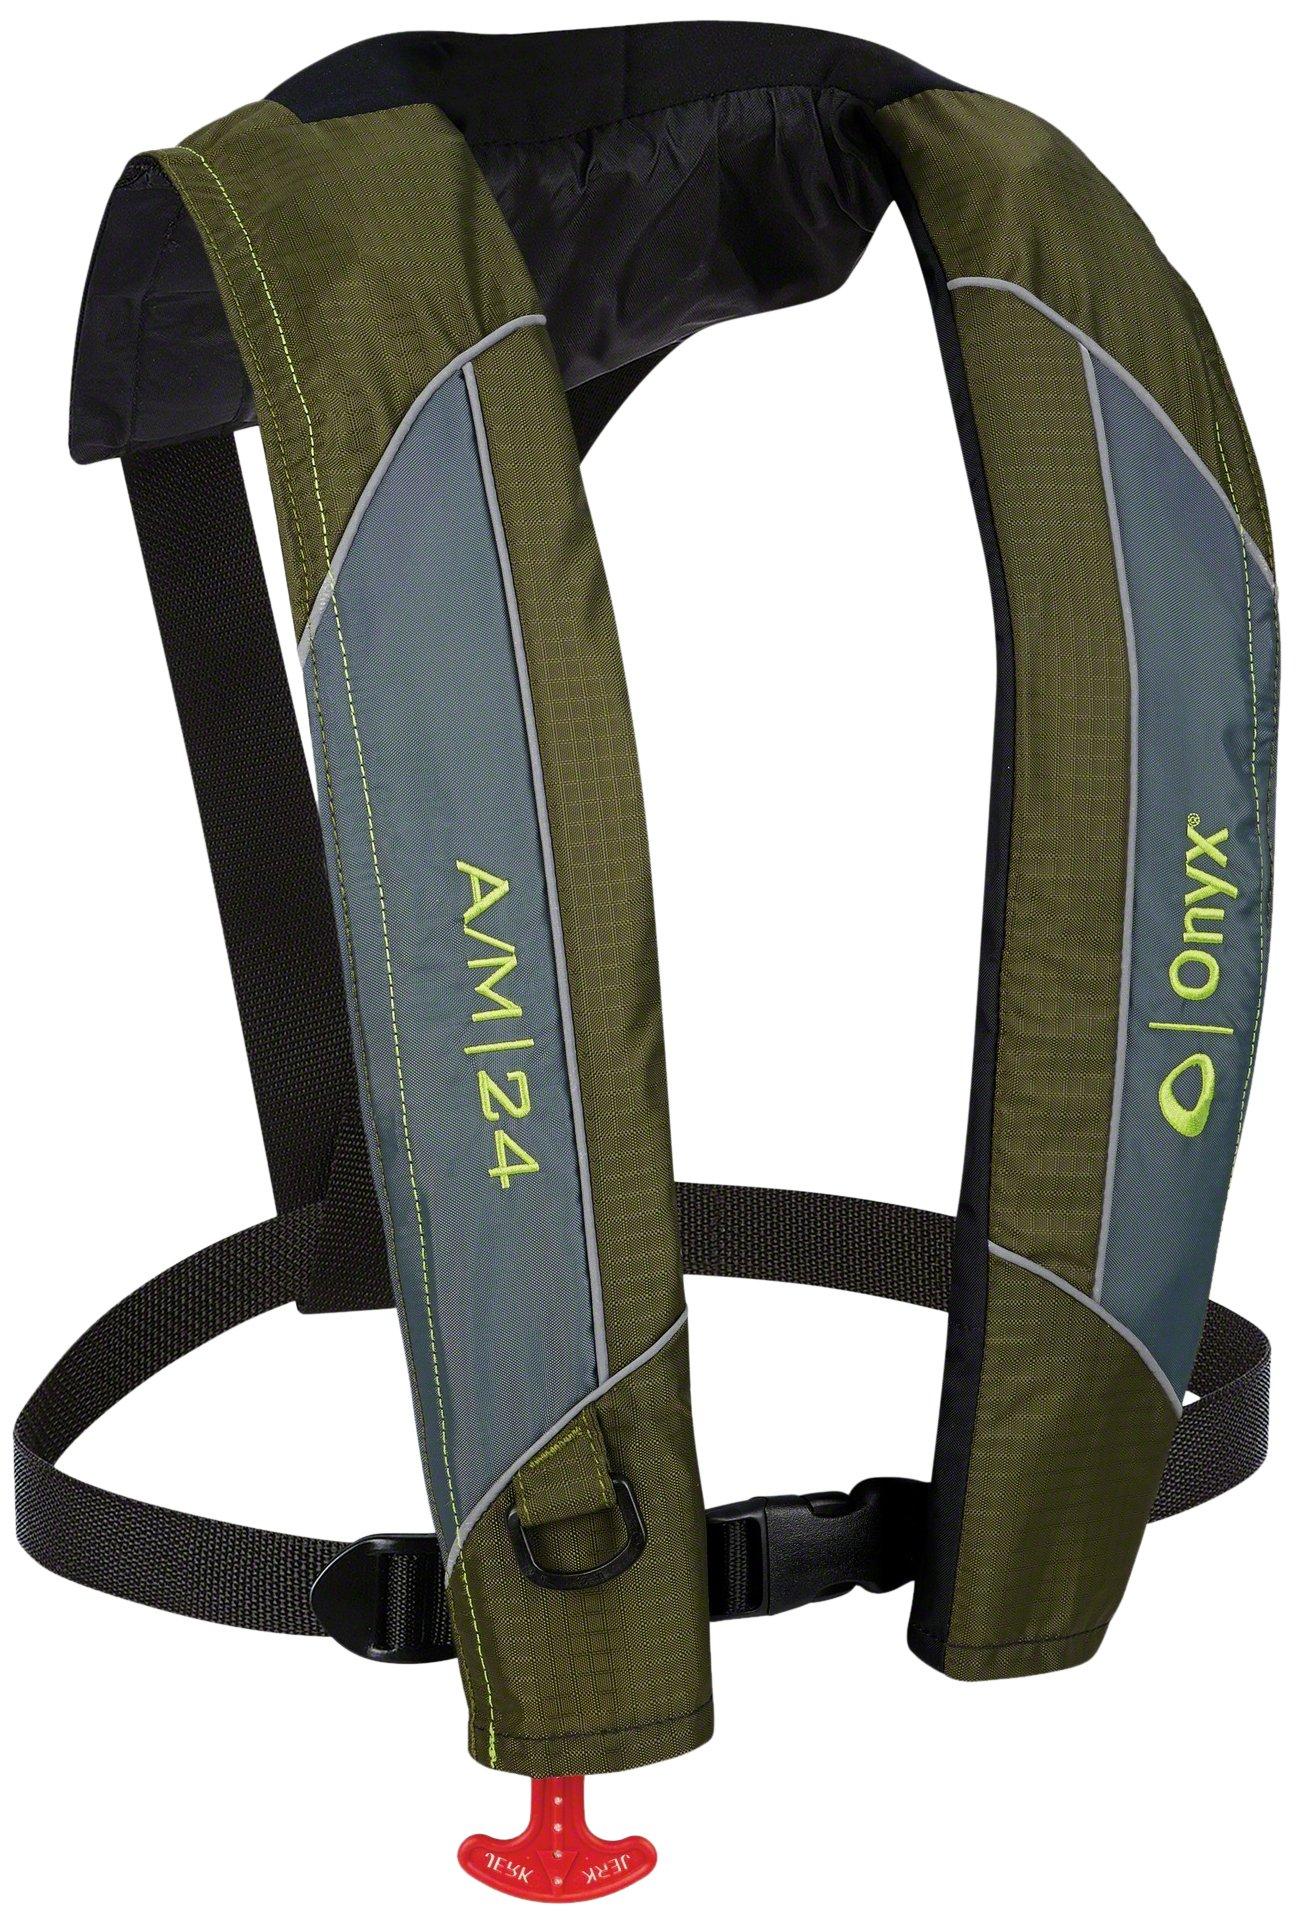 Onyx 132000-400-004-18 A/M-24 Vest by Onyx